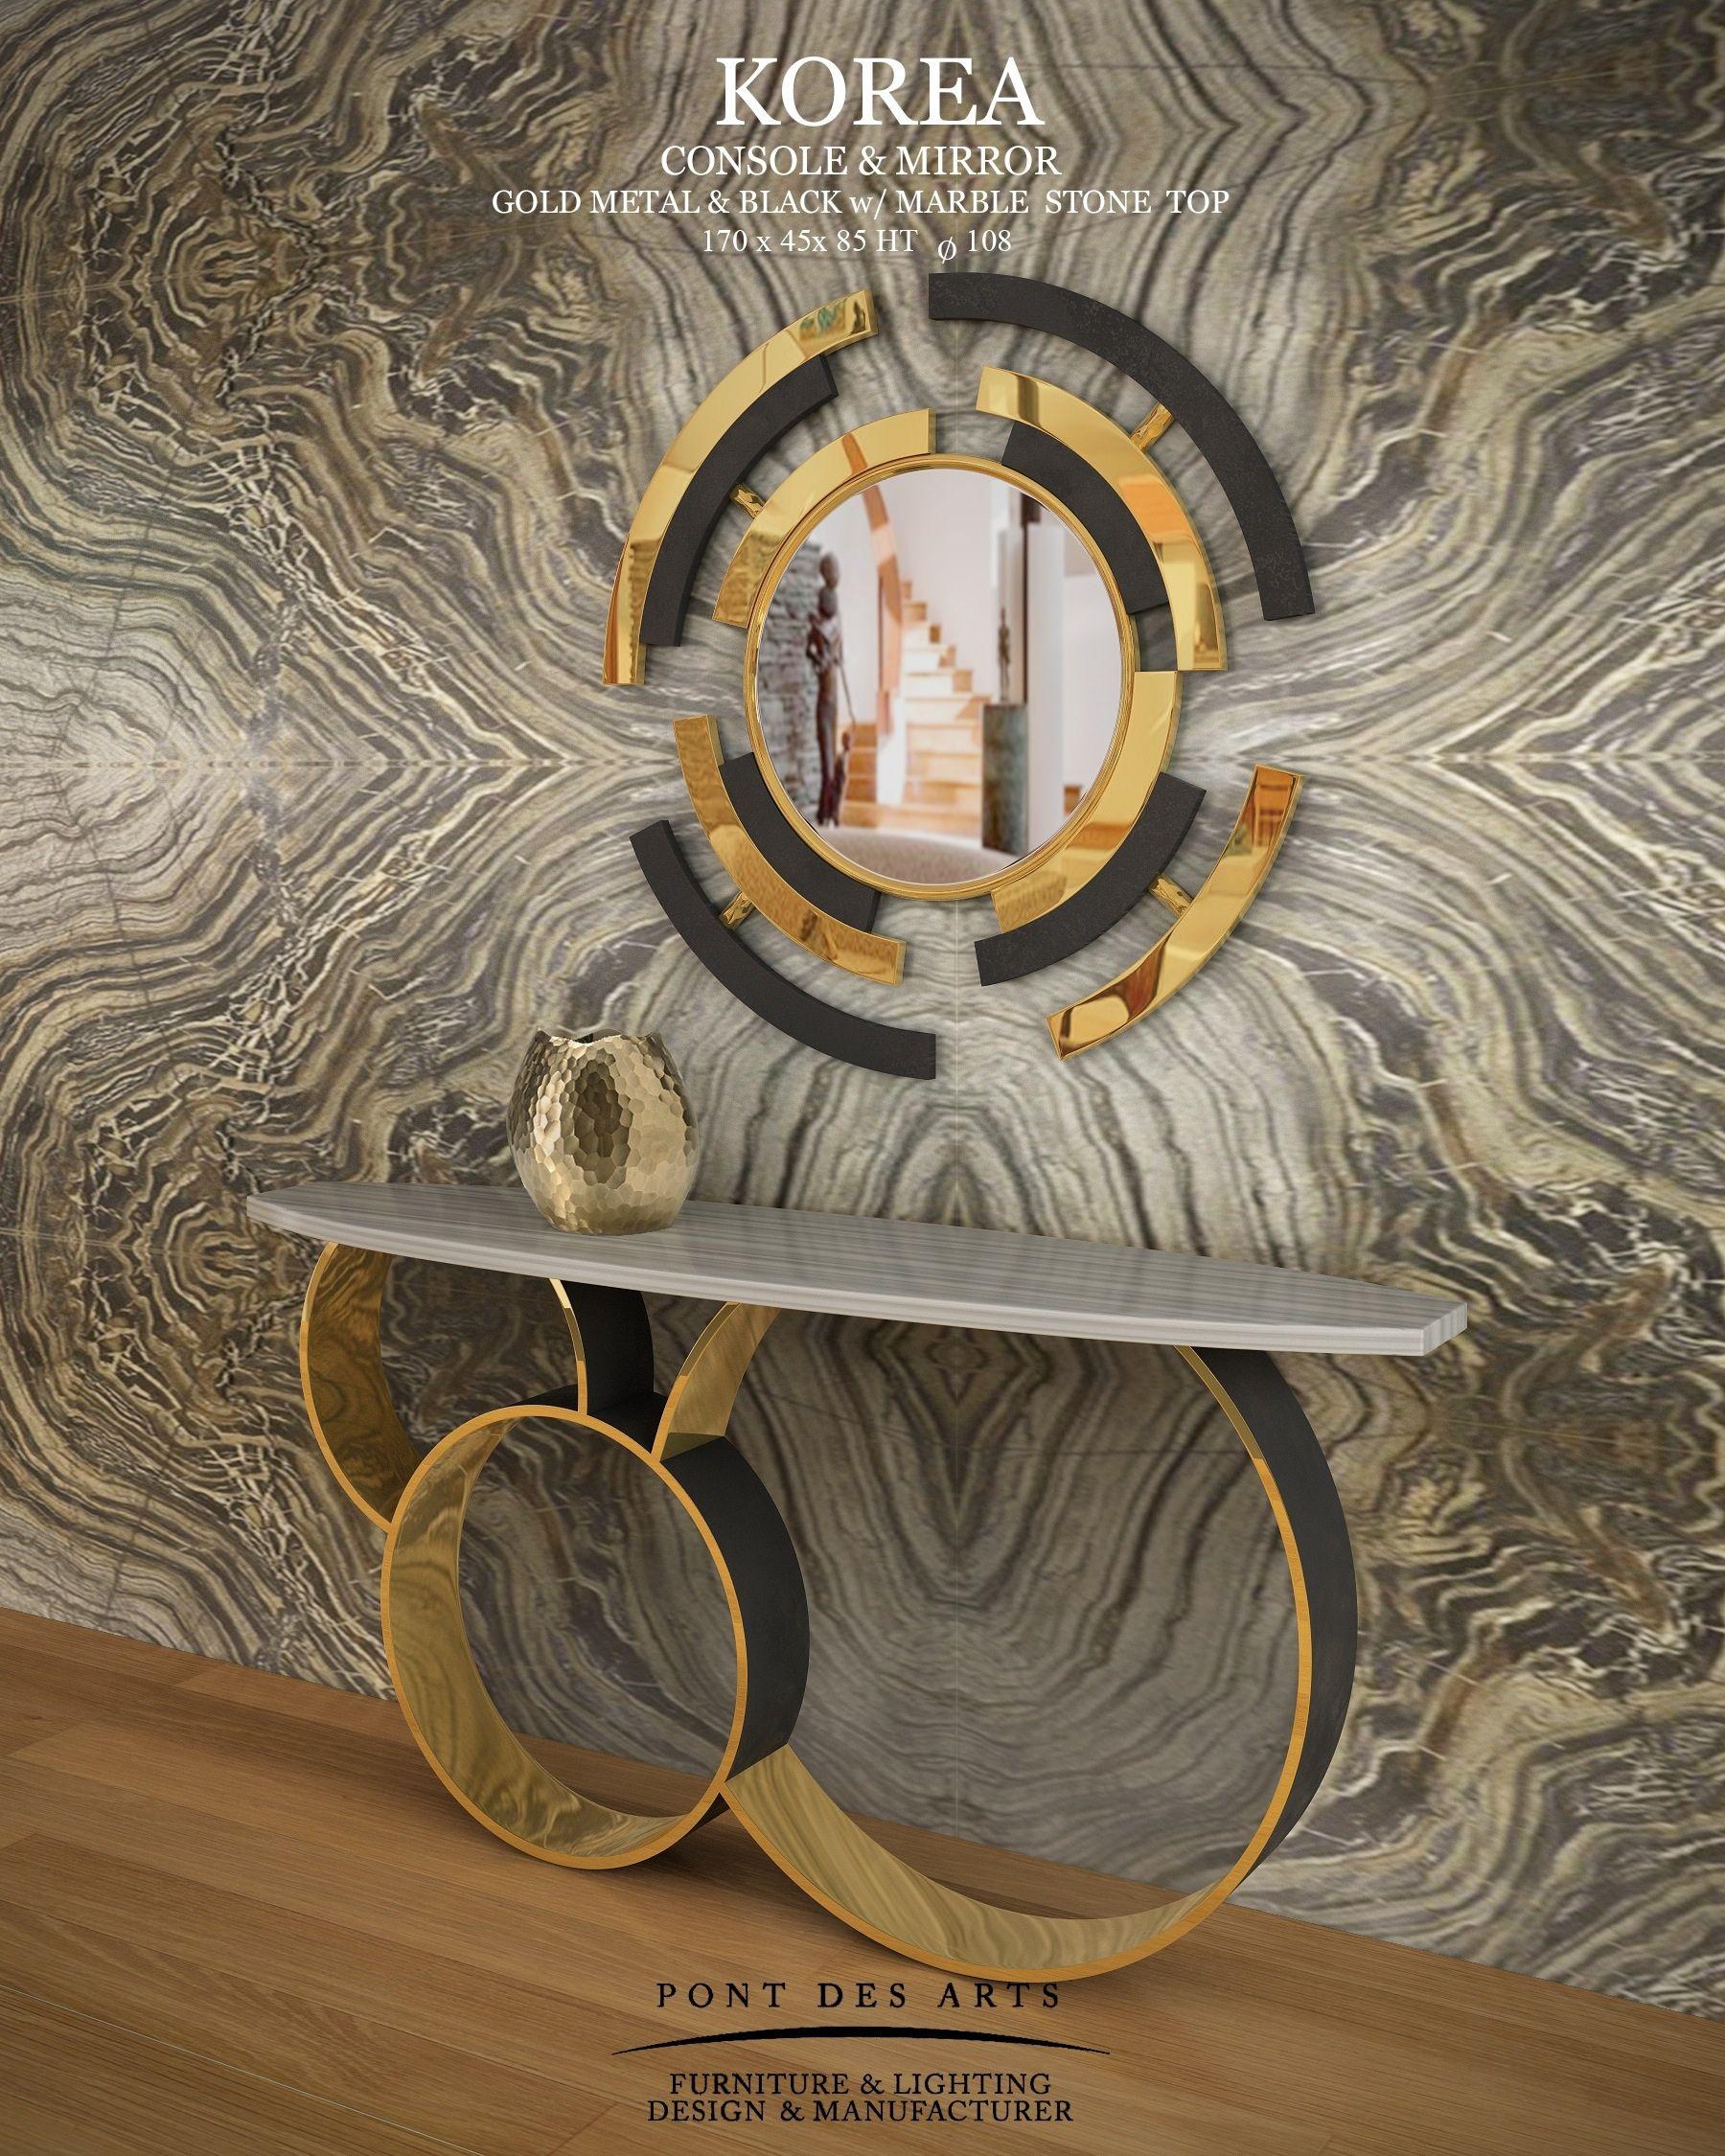 korea console mirror pont des arts studio designer. Black Bedroom Furniture Sets. Home Design Ideas